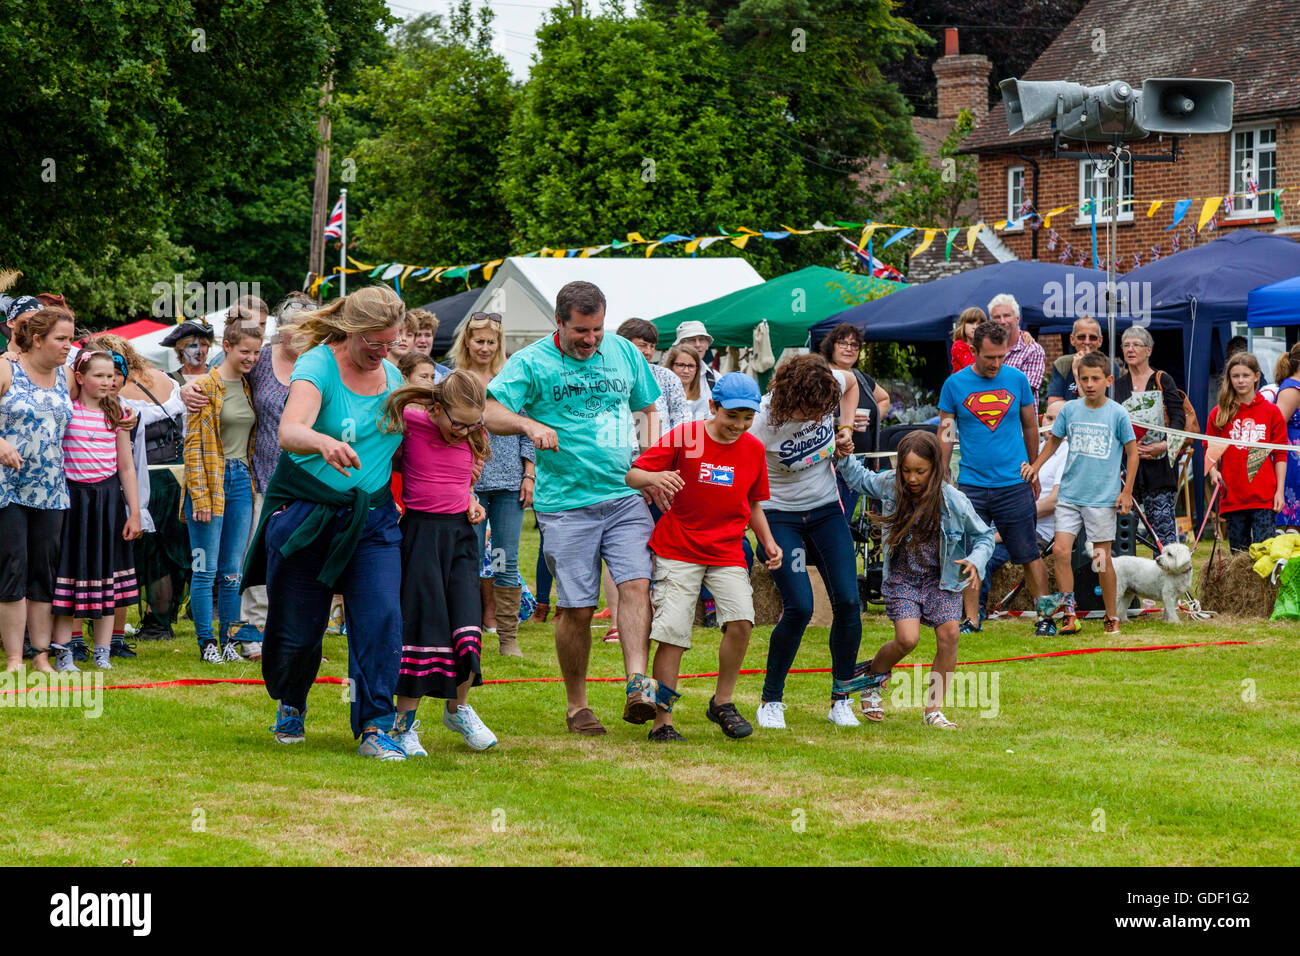 Families Take Part In A Traditional Three Legged Race At Fairwarp Village Fete, Fairwarp, East Sussex, UK - Stock Image